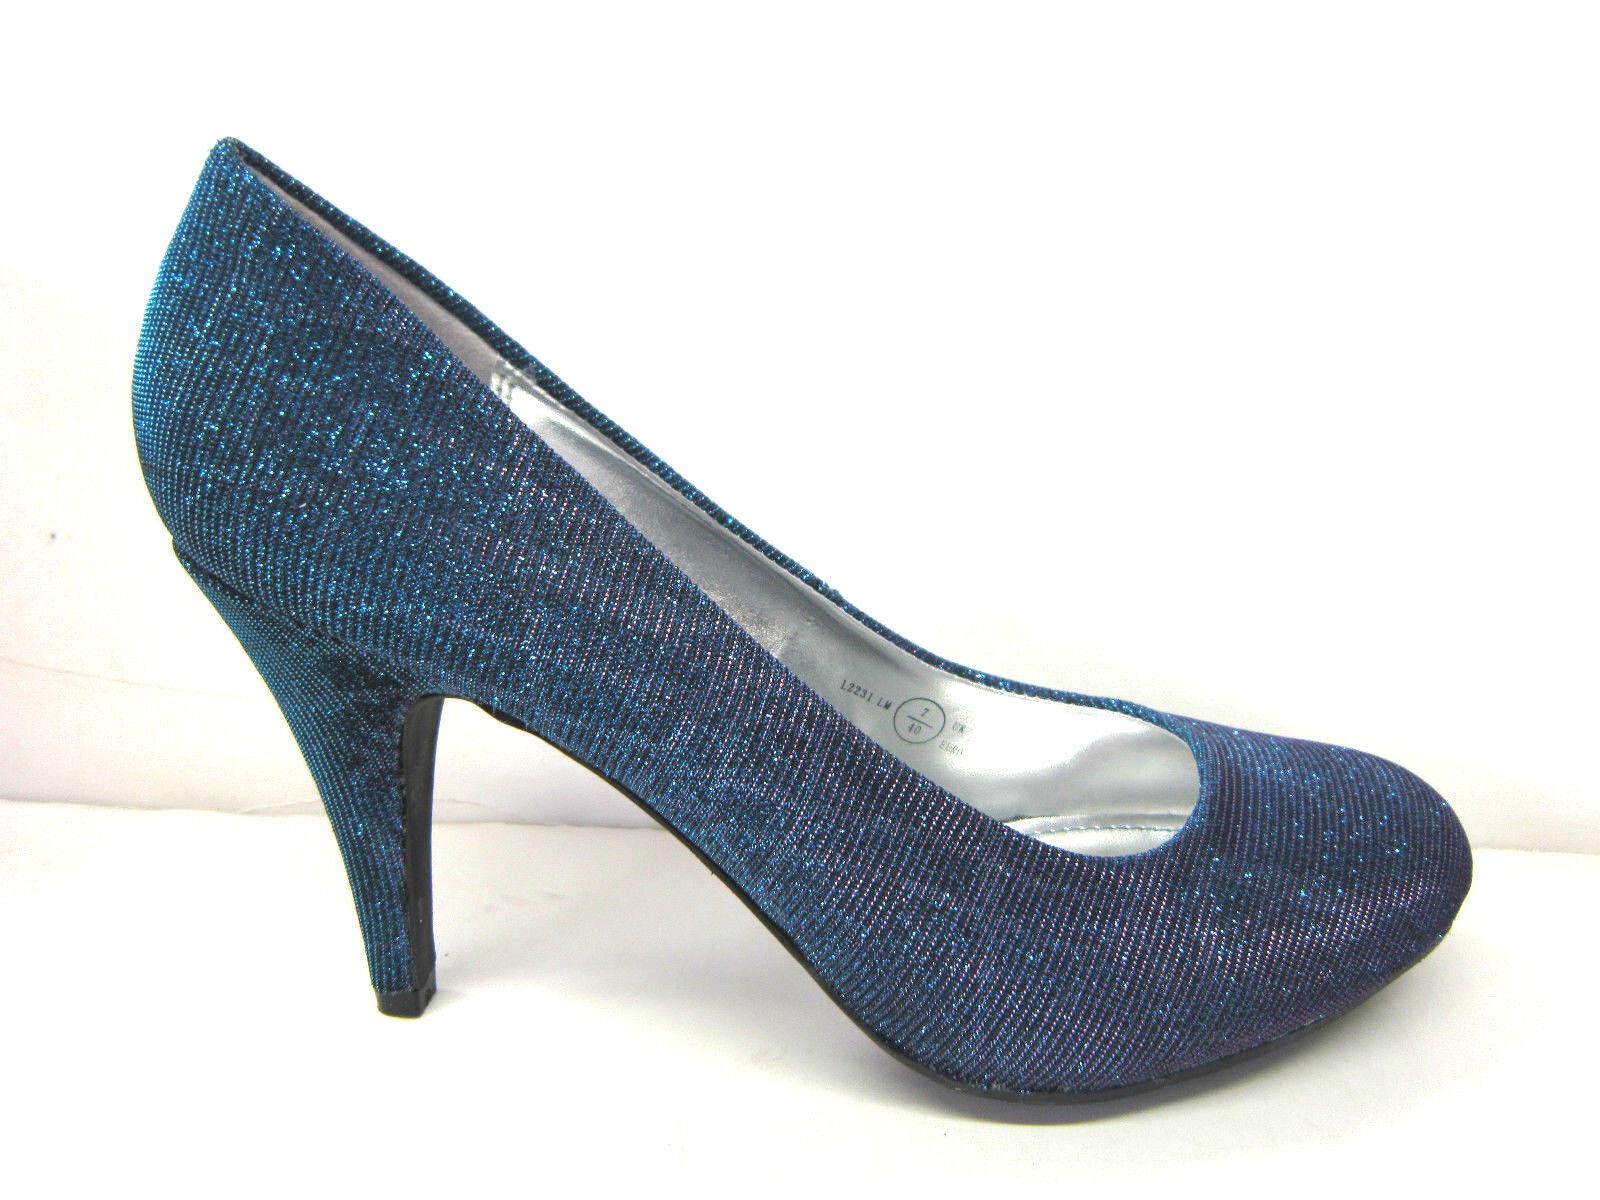 Moda jest prosta i niedroga **SALE** Ladies Blue Multi Colour Changing Glitter Effect Court Shoes. L2231